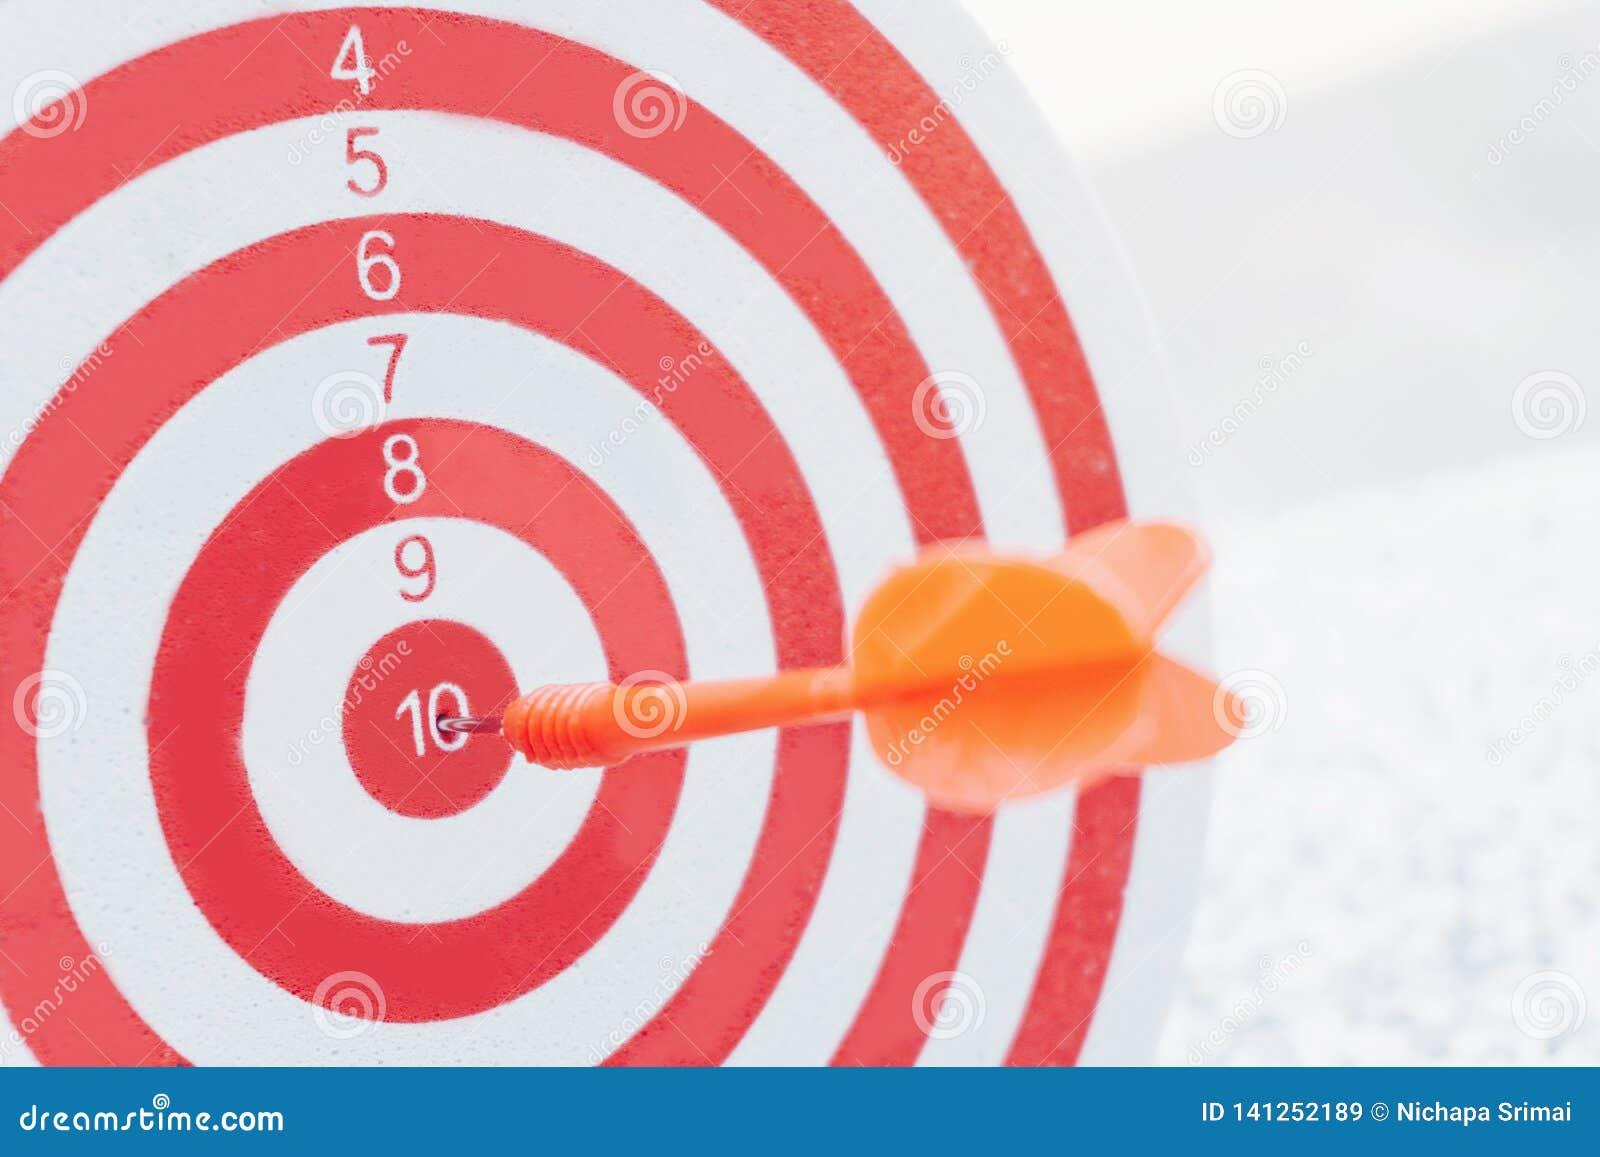 Стрелки концепции руководства по цели archery концепции дела цели dartboard